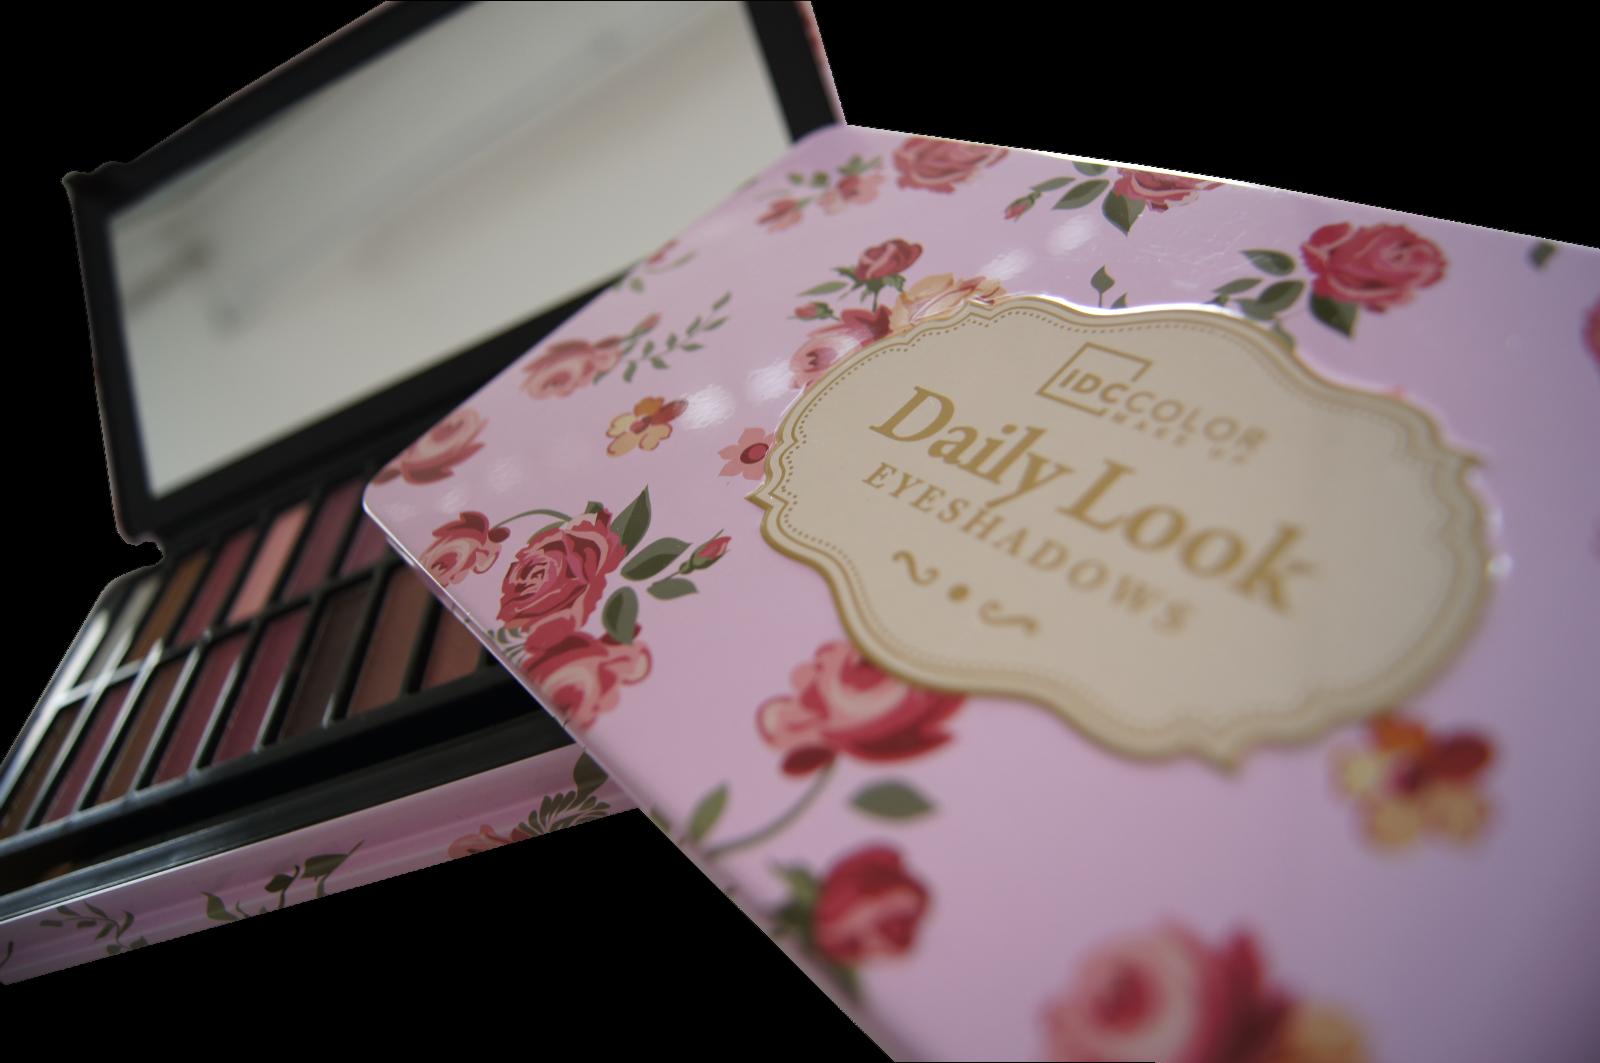 Lidschatten Palette DAILY LOOK mit 24 Farben Applikator Pinsel Spiegel Eyeshadow